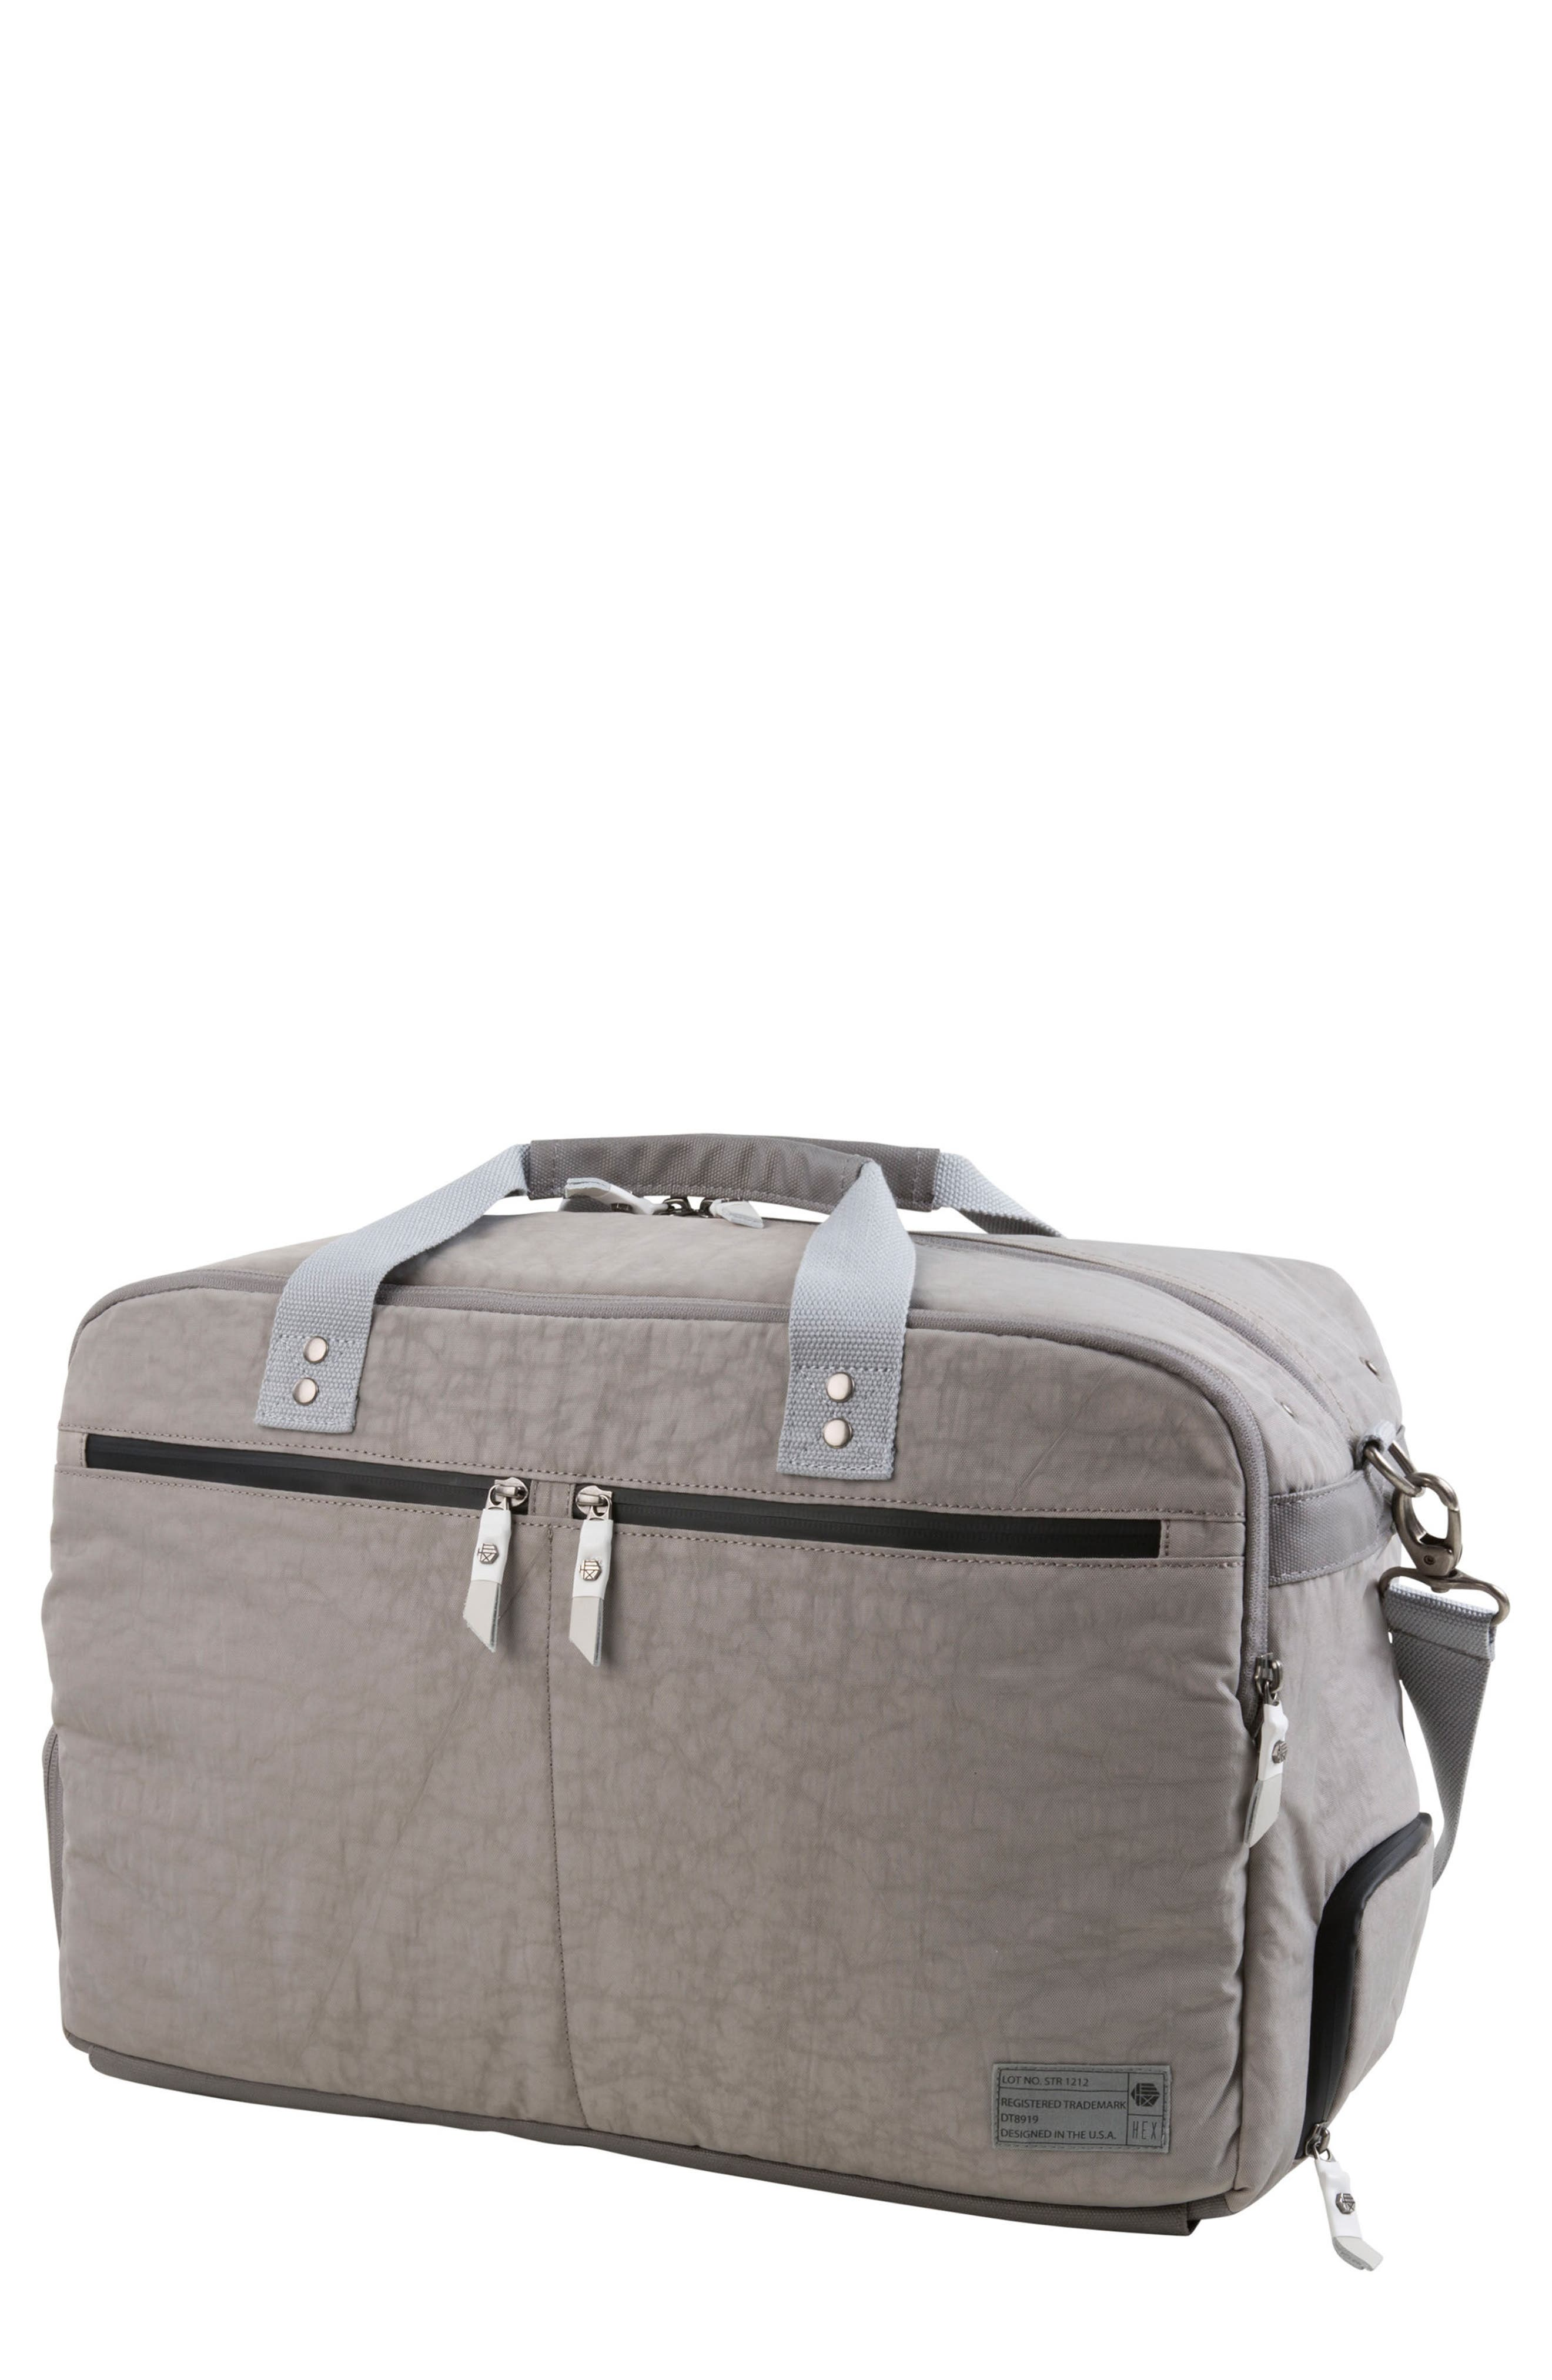 Calibre Convertible Duffel Bag,                         Main,                         color, Strata Grey